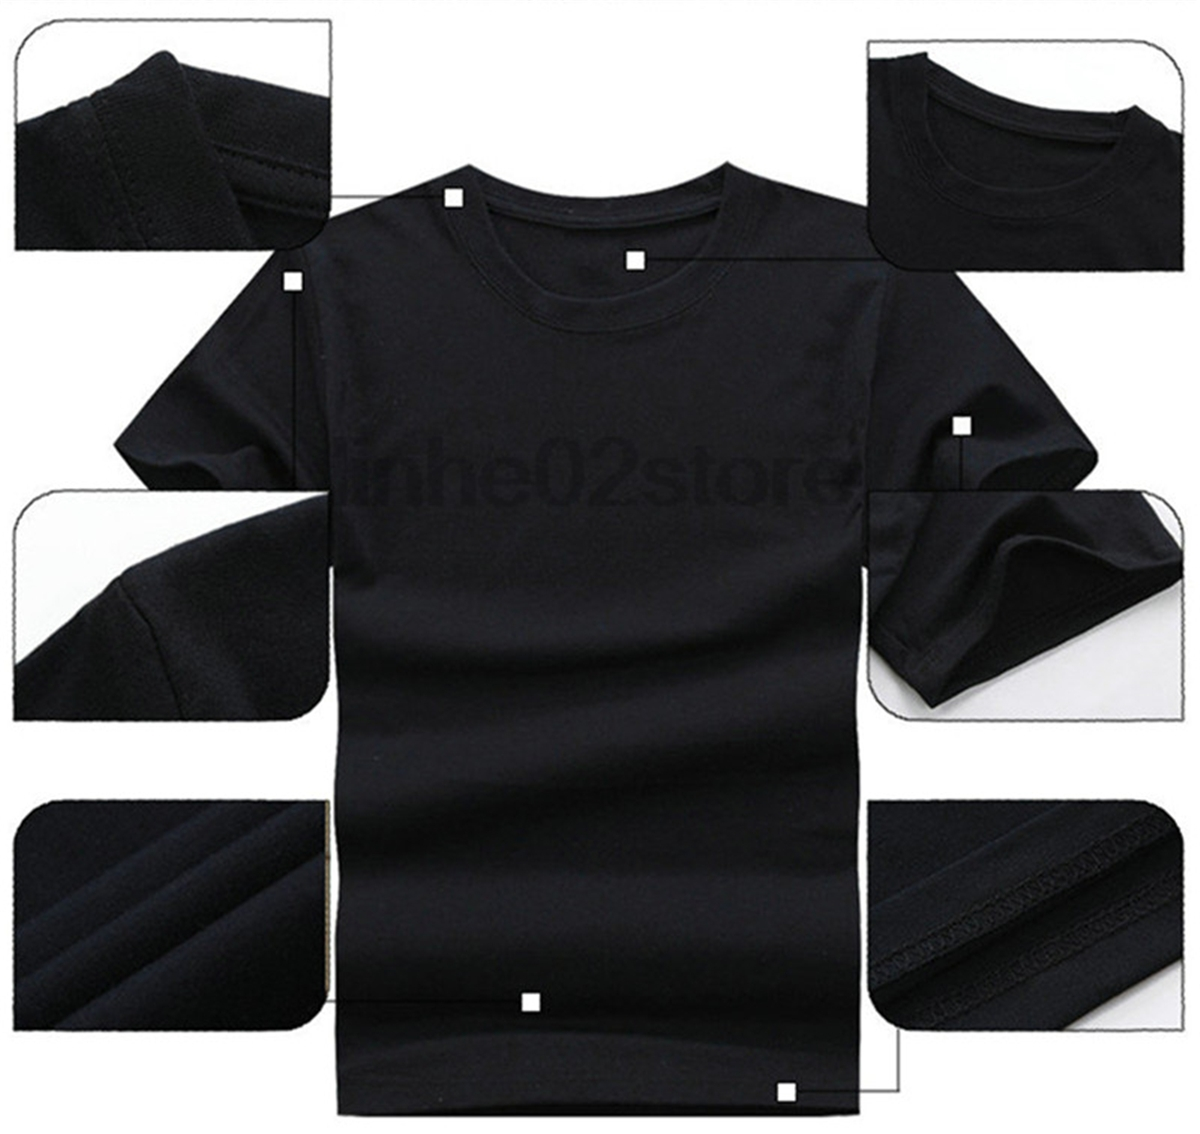 GILDAN I Tell Bad Chemical Jokes Because All Good Ones Argon Tshirt Mothers Day Ms. T-shirt summer dress T-shirt